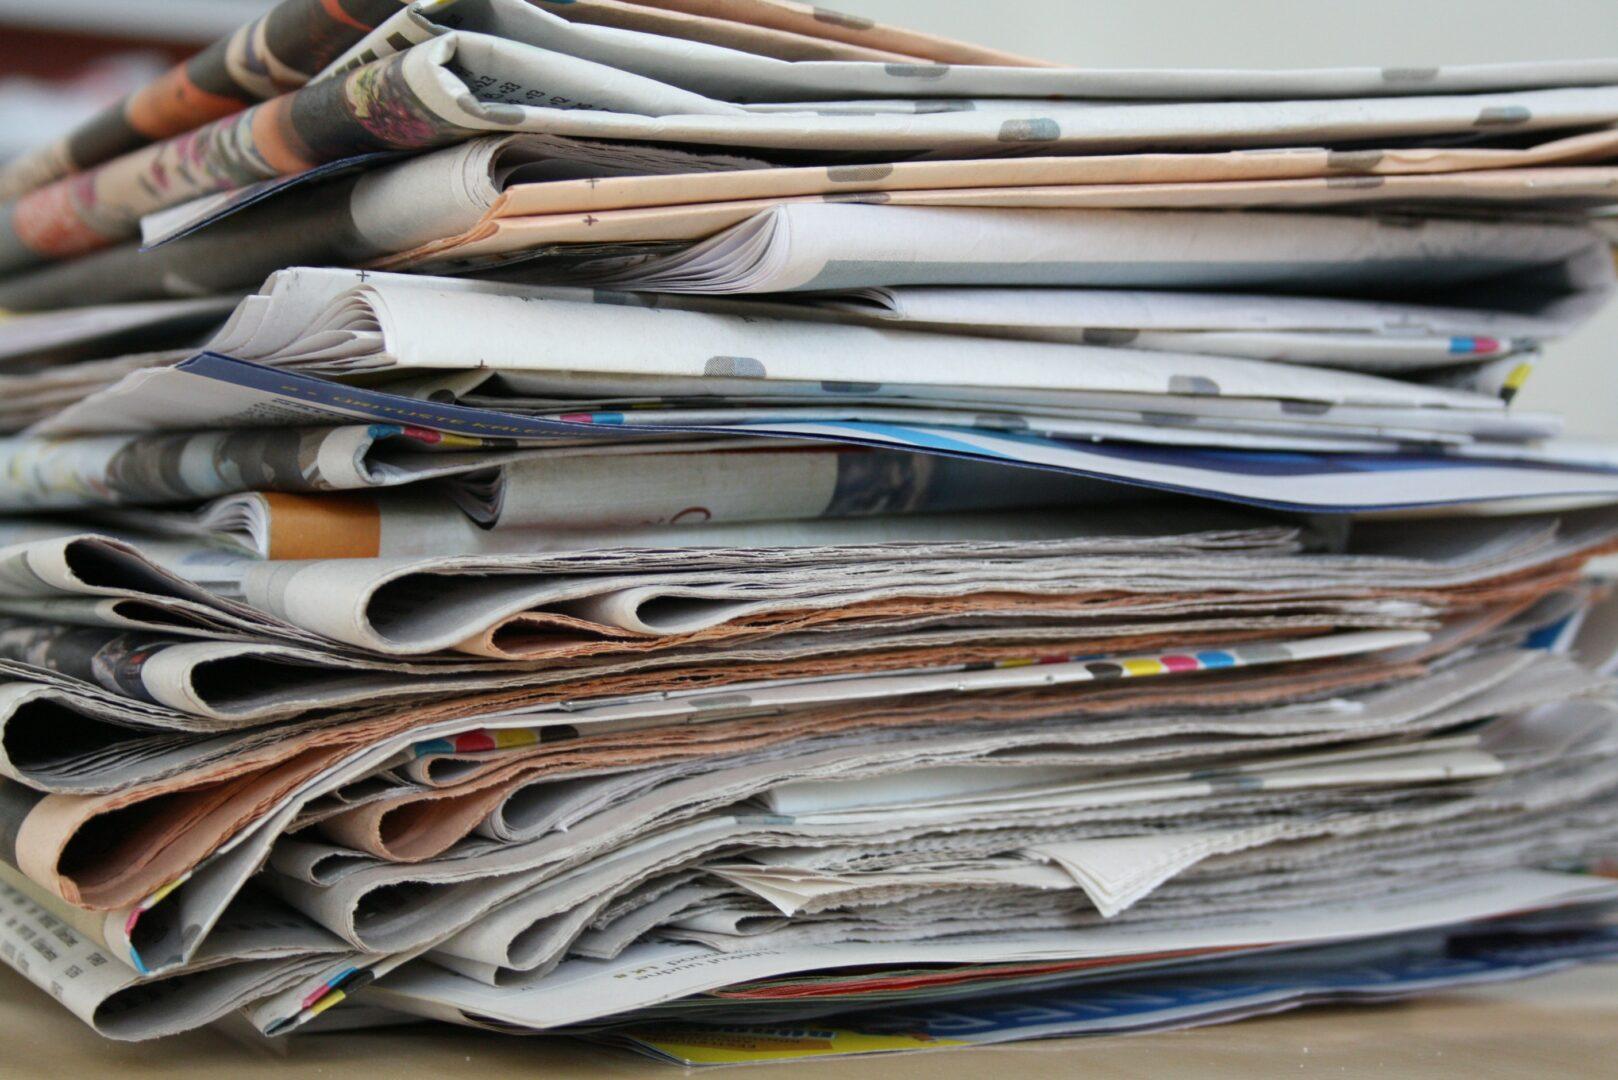 Journaux à recycler